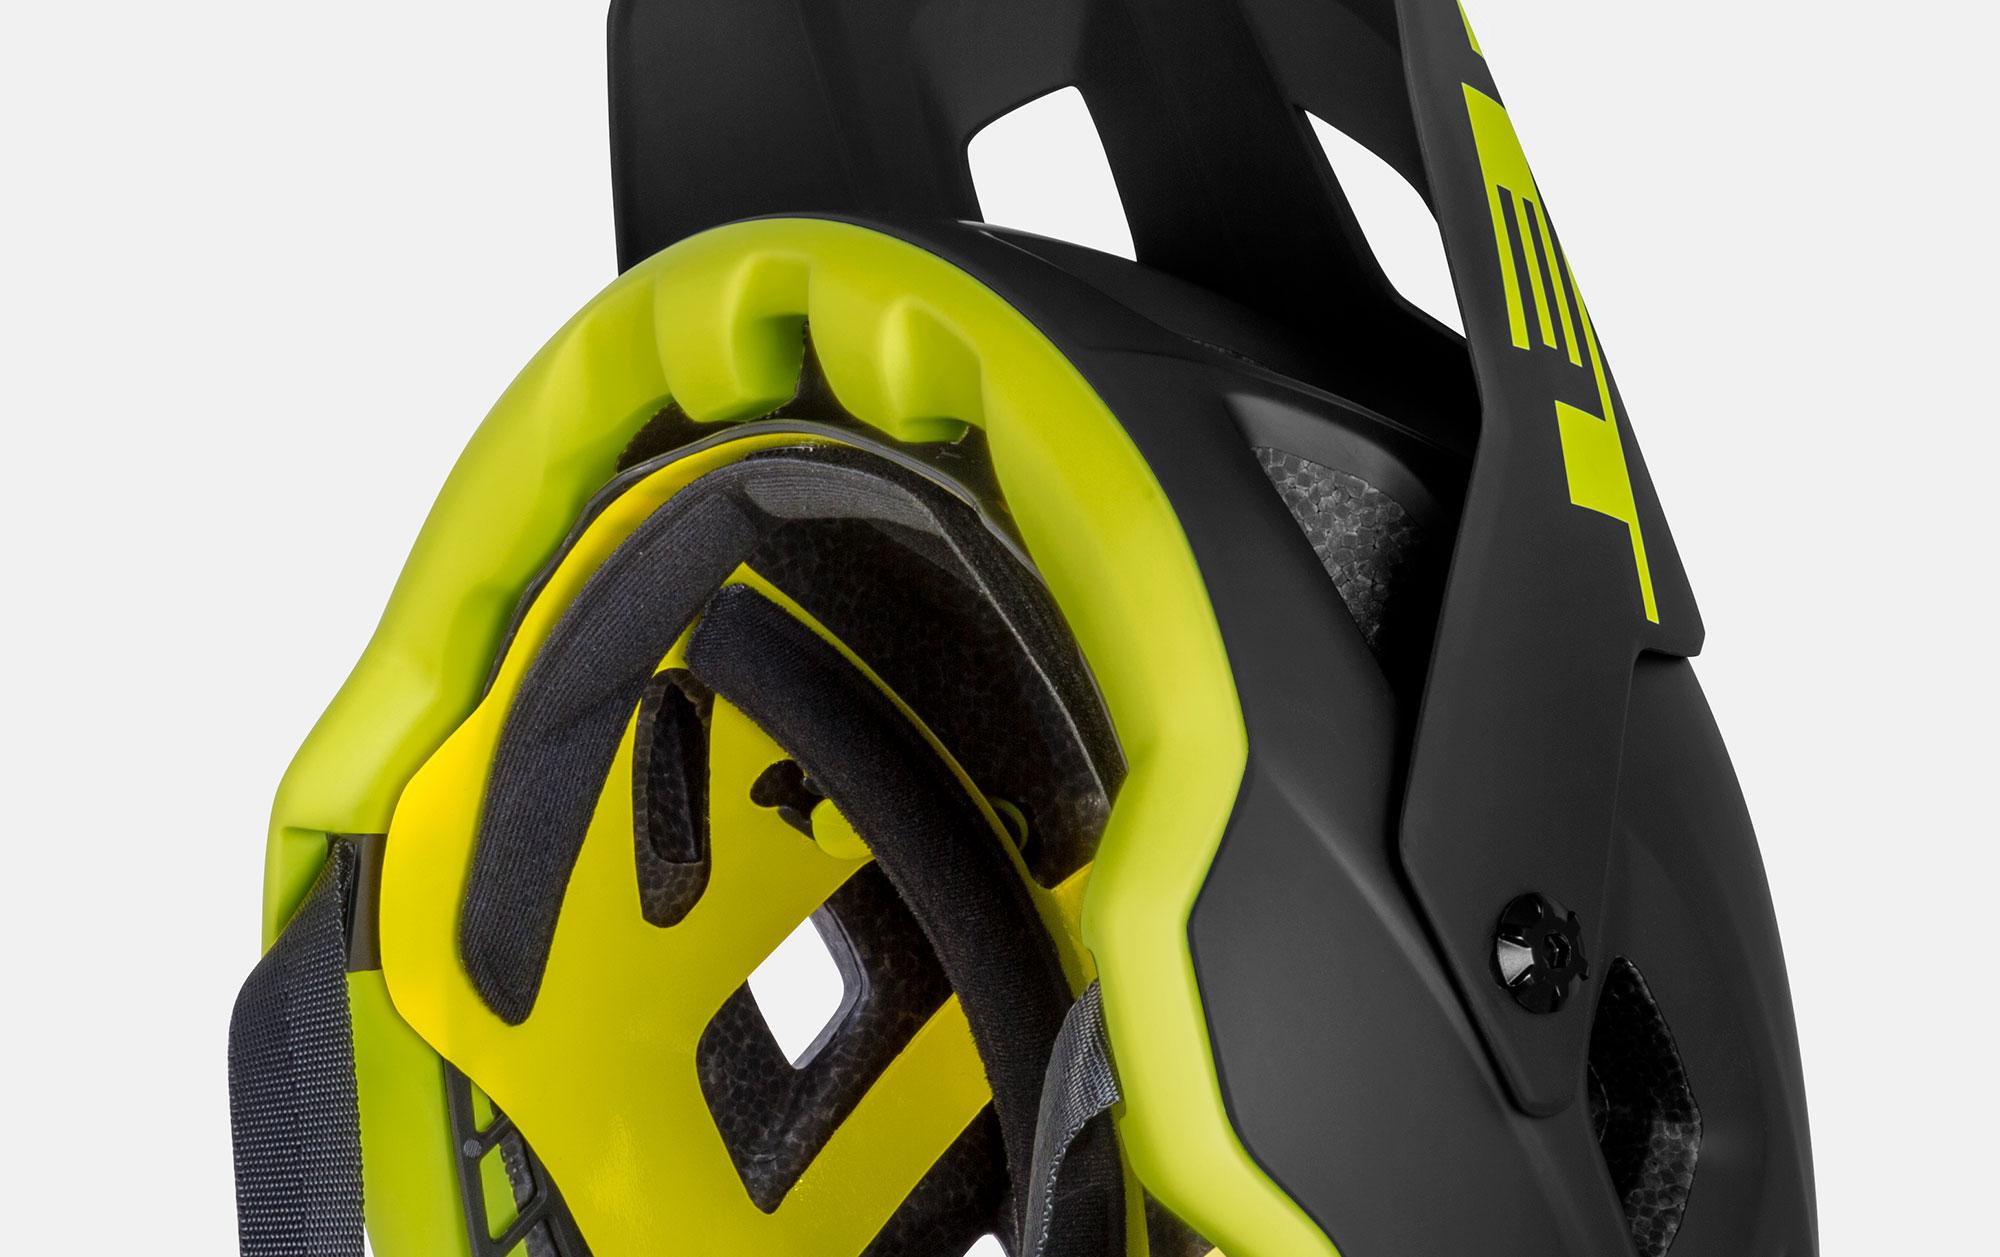 MET Terranova Mips Trail and E-MTB Helmet Brain Protection System